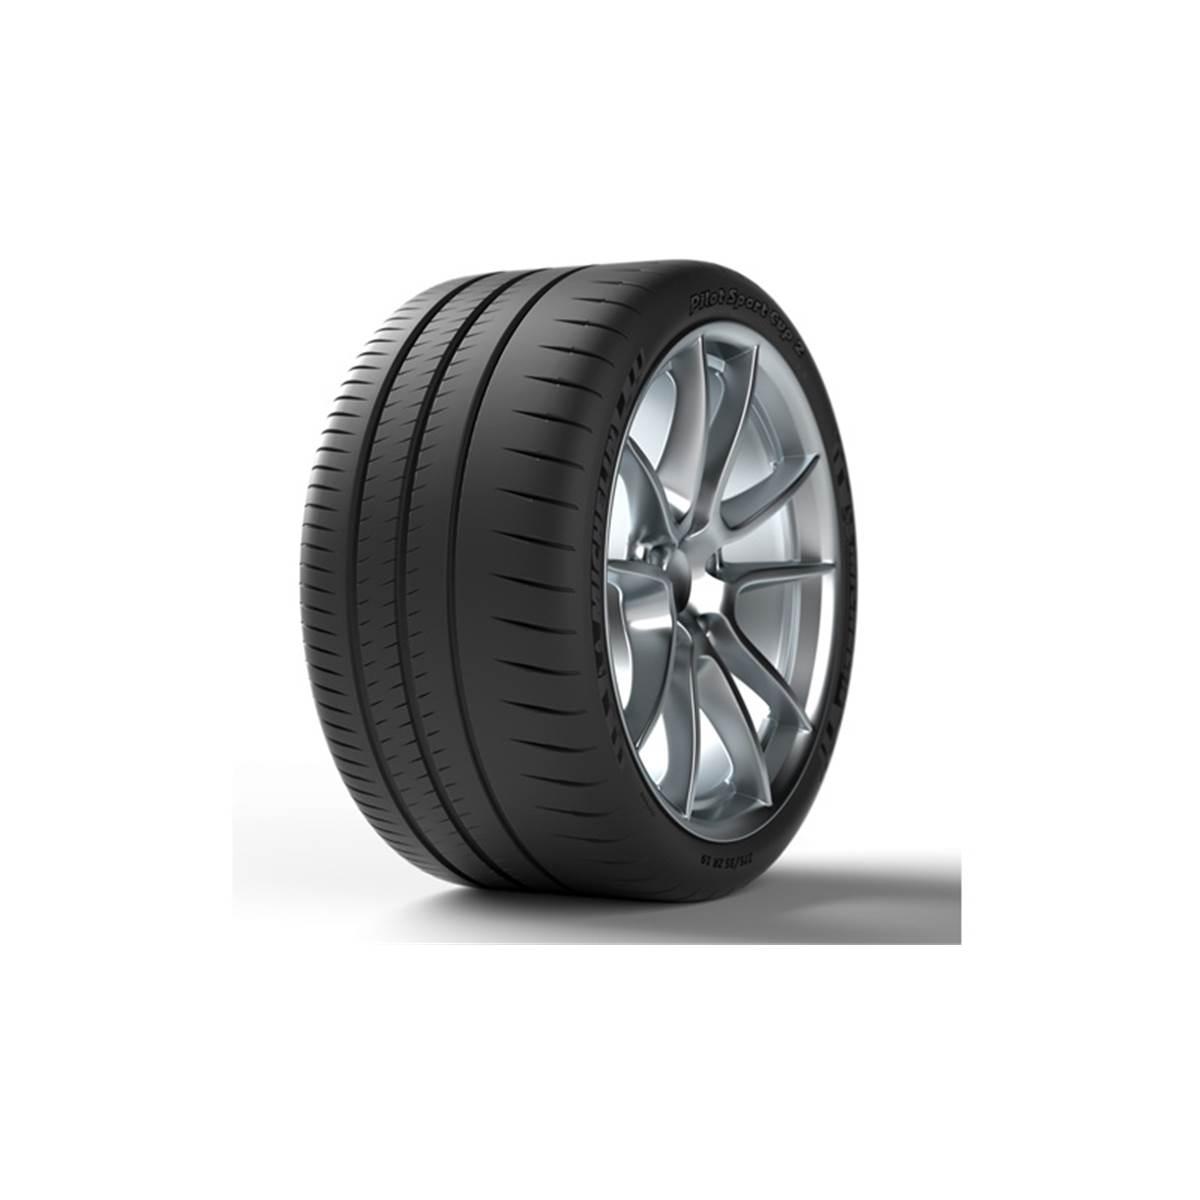 Pneu Michelin 305/30R19 102Y Pilot Sport Cup 2 XL